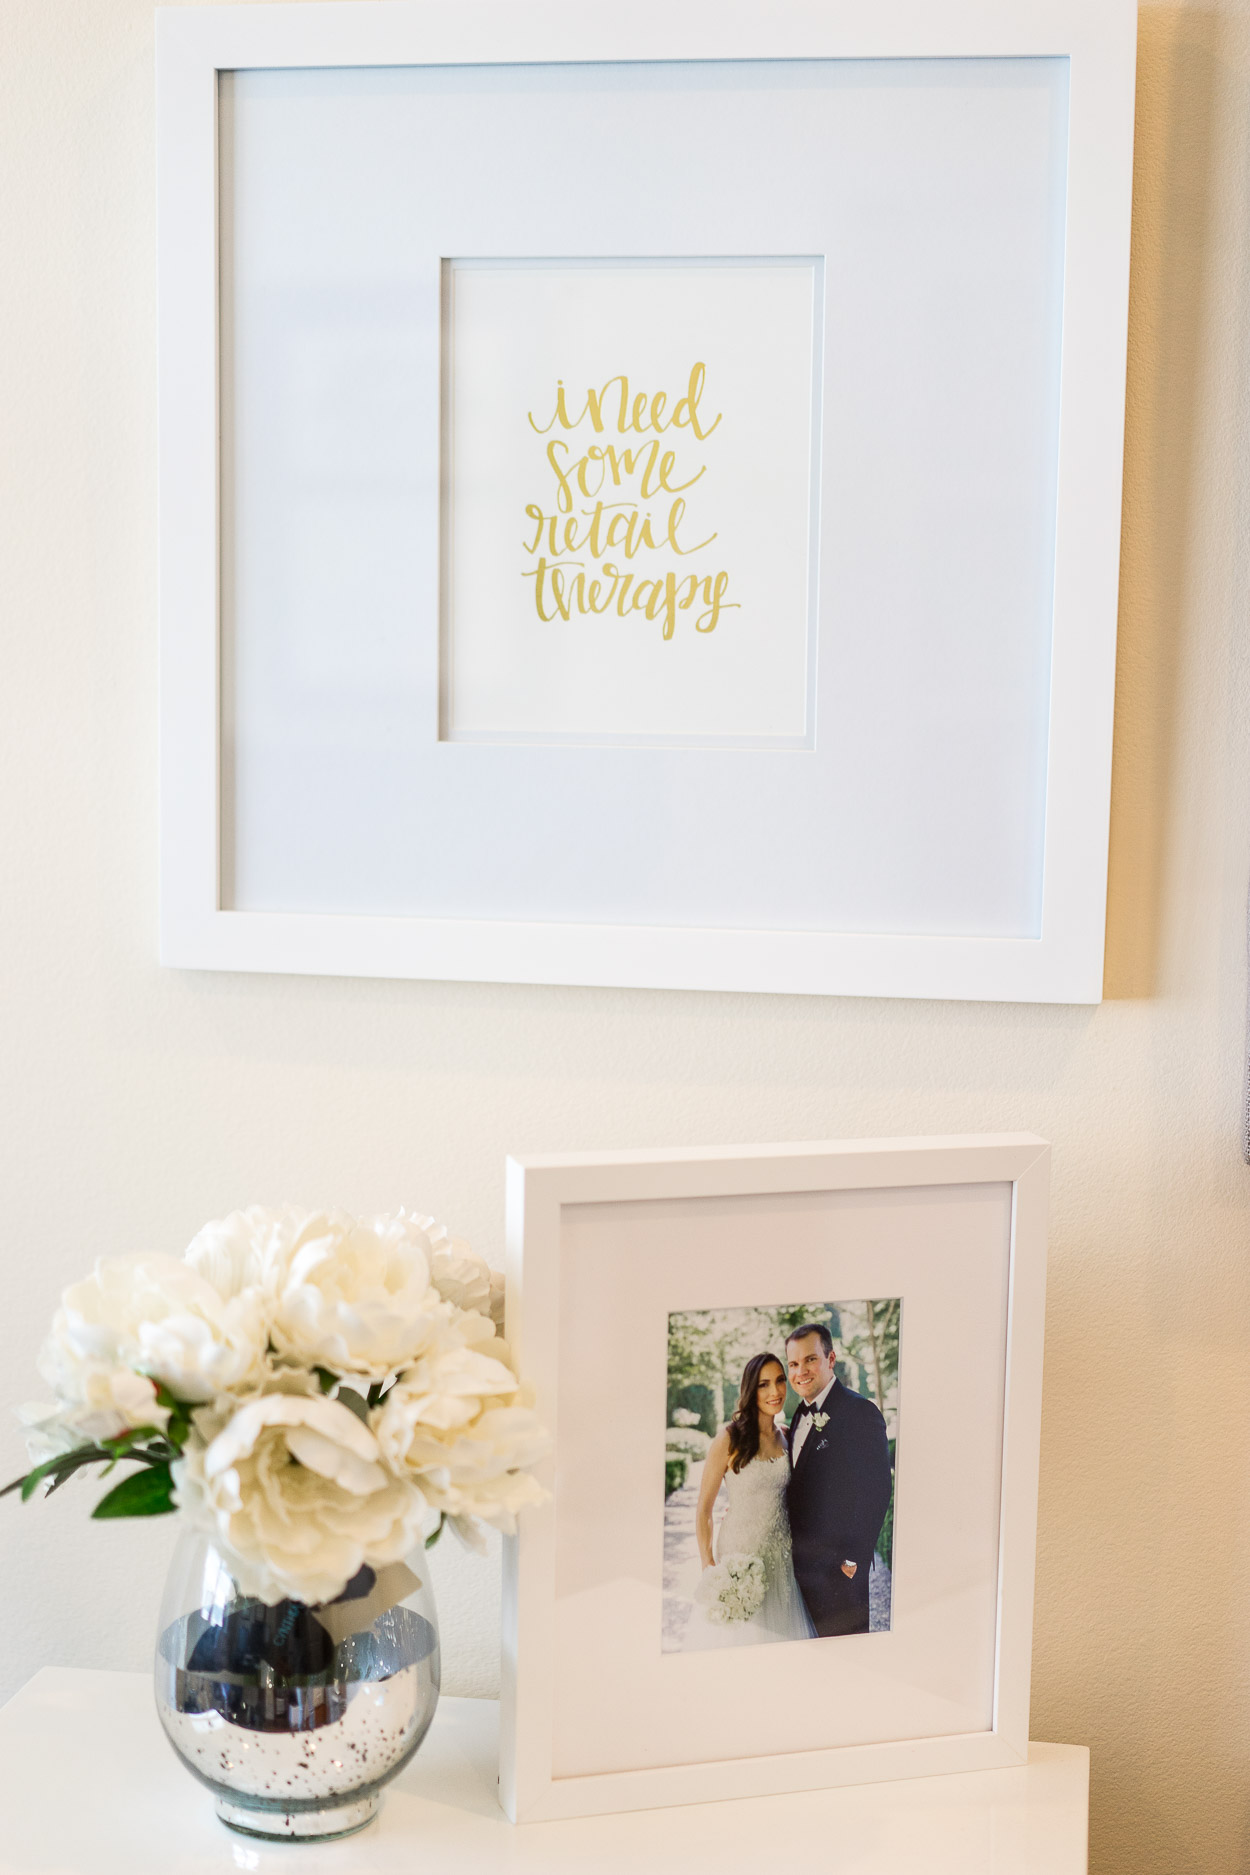 The Chloe wedding frame from Framebridge styled by fashion blogger Amanda of A Glam Lifestyle